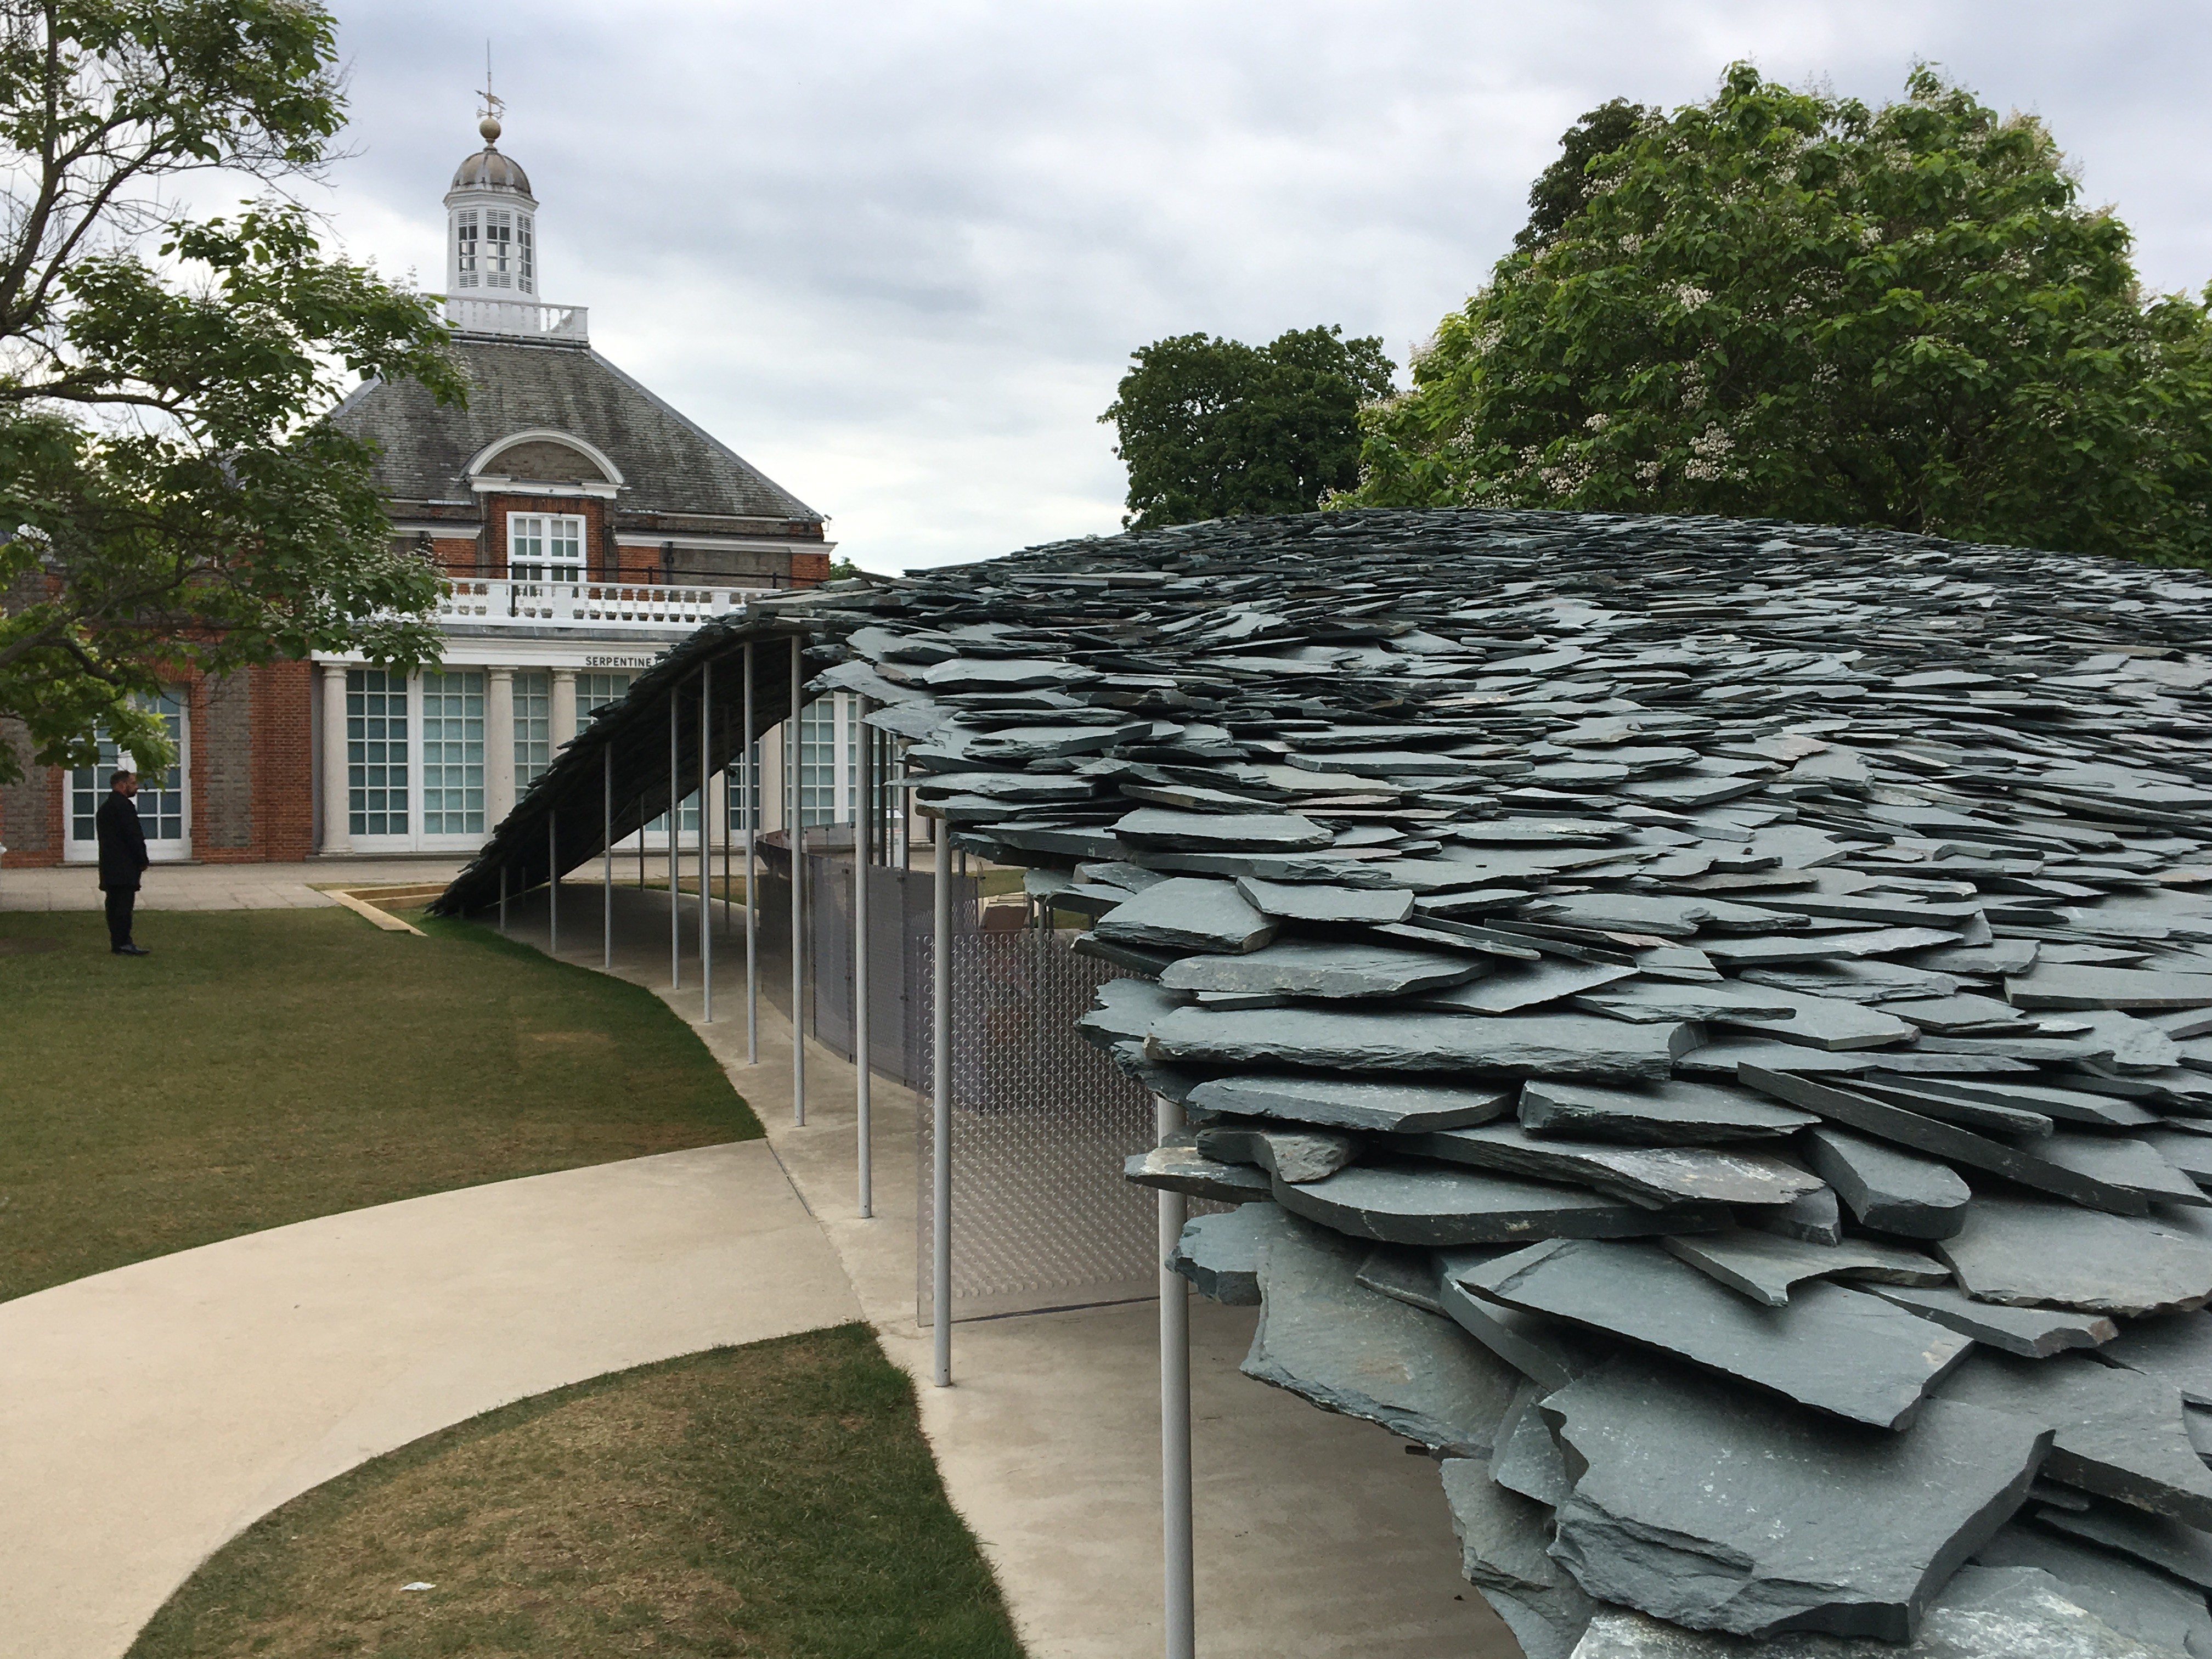 Junya Ishigami's Serpentine Pavilion architecture